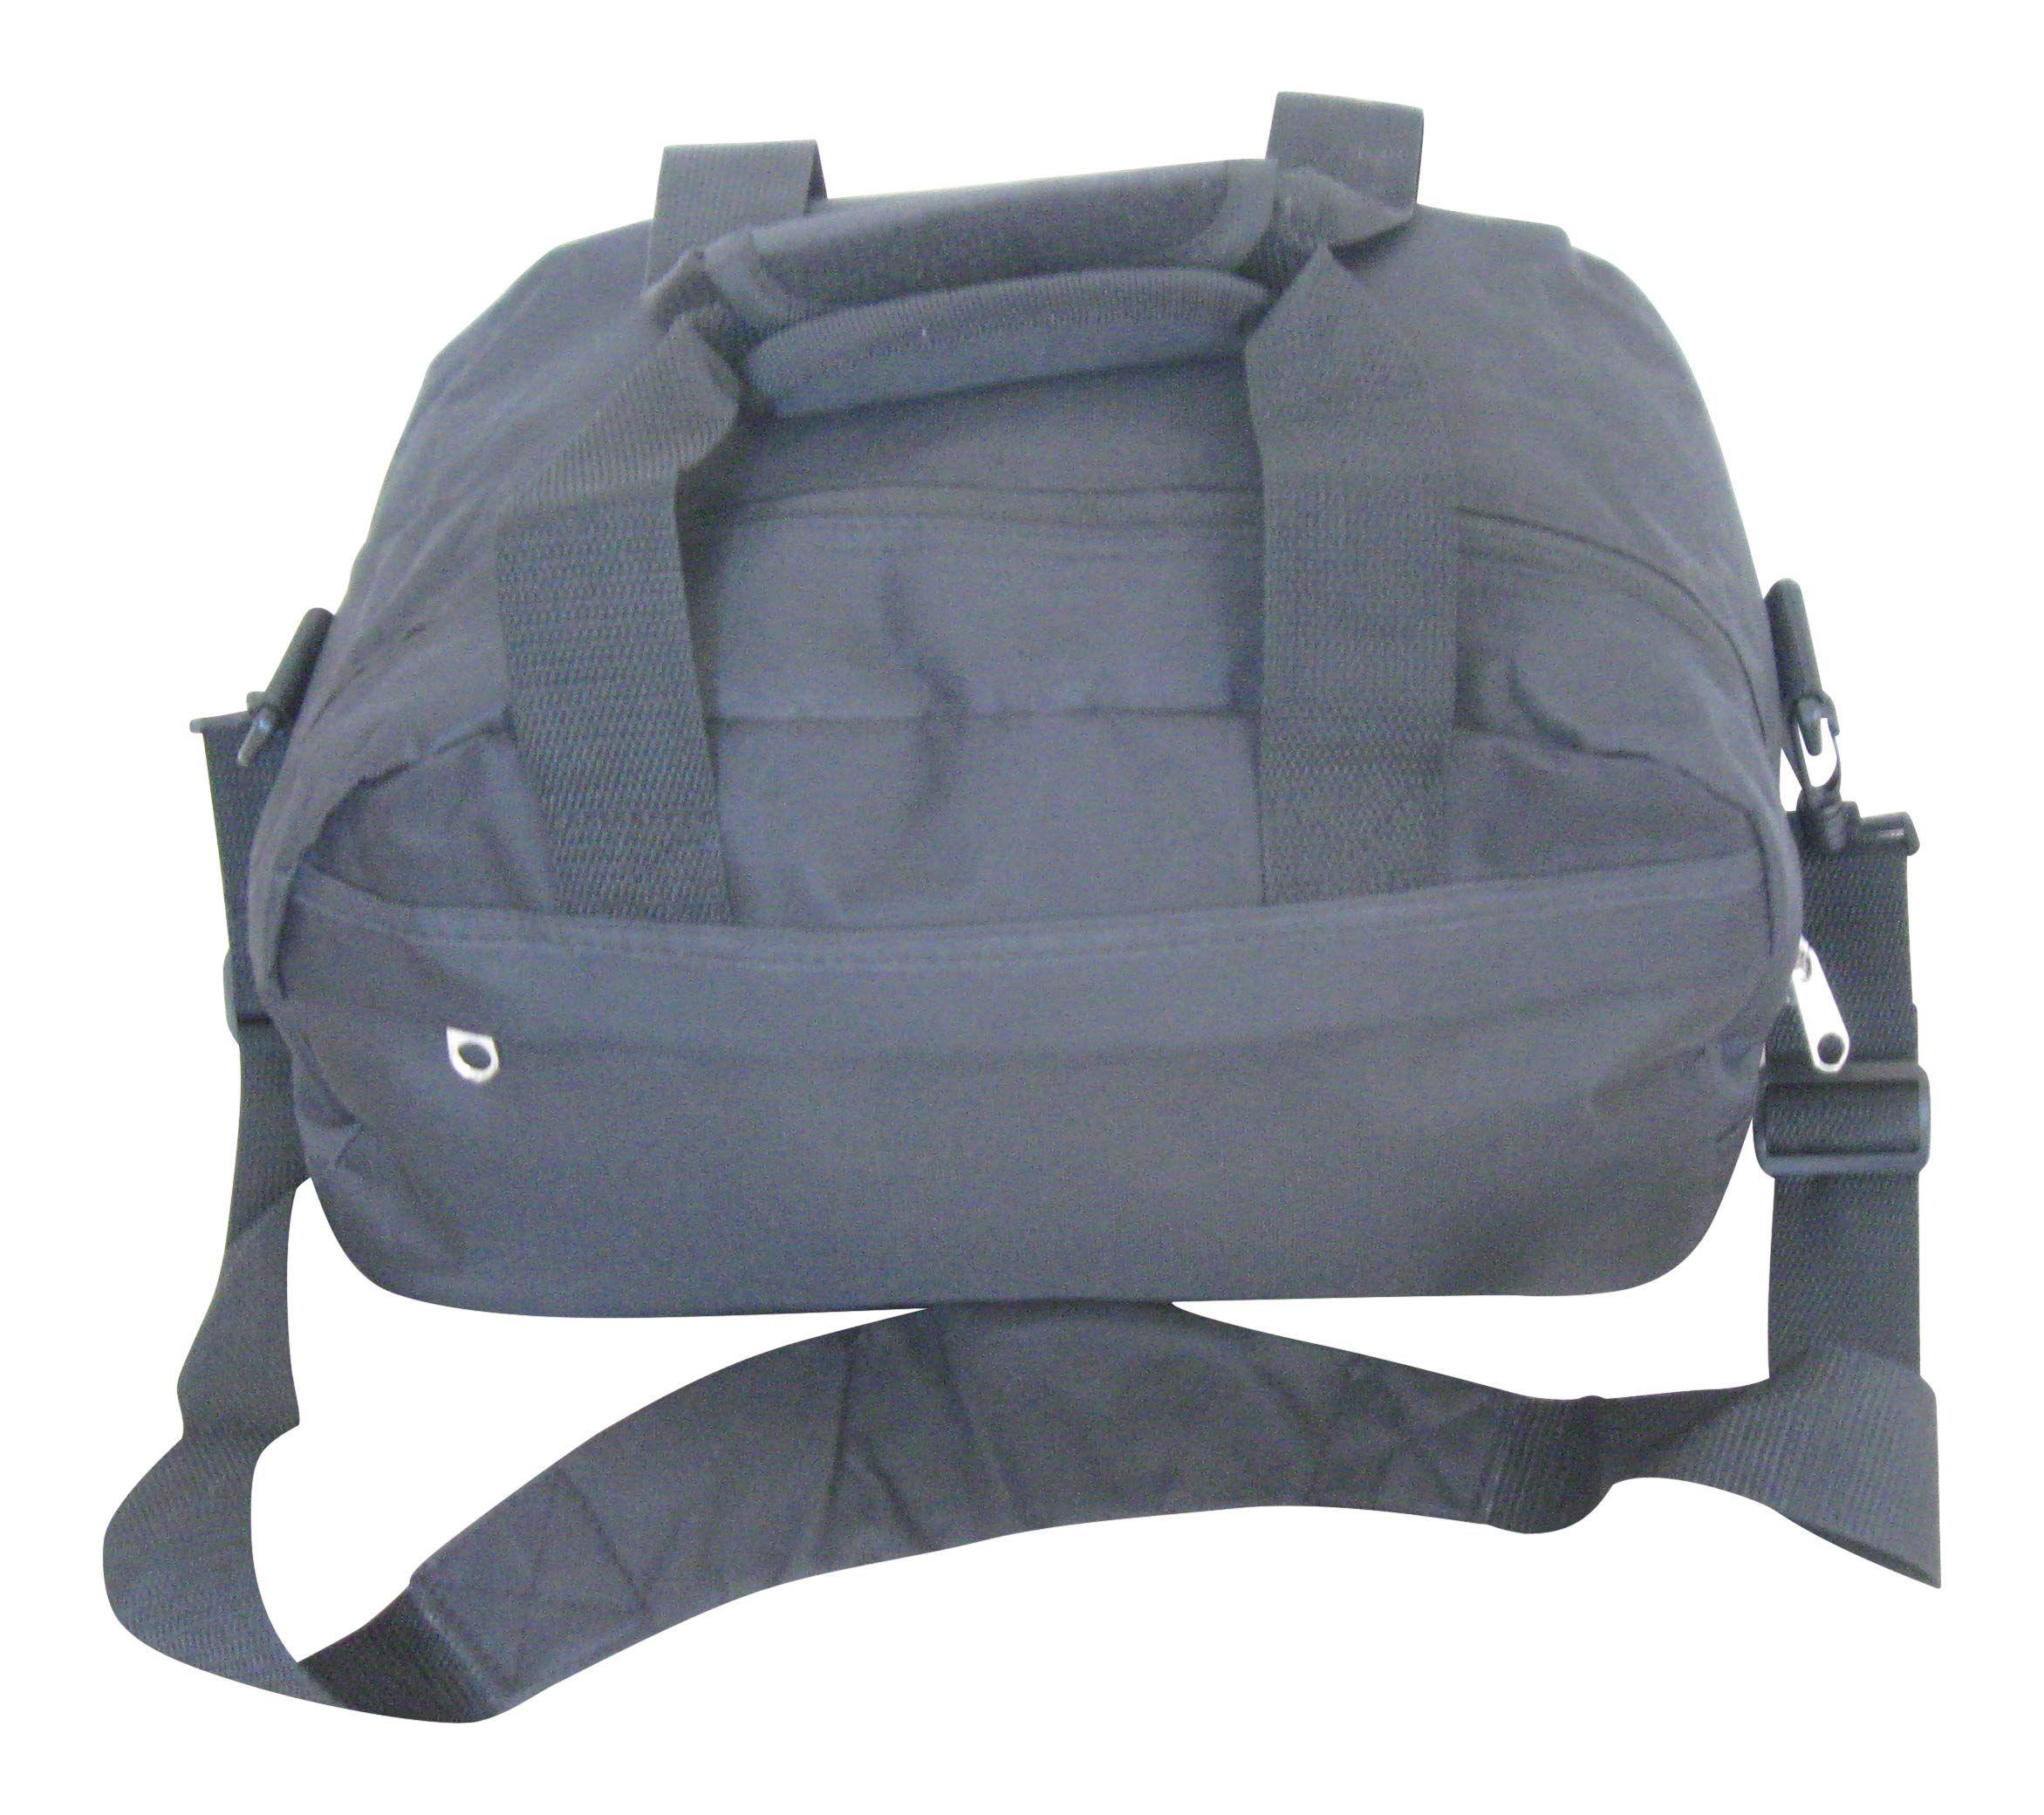 3525e205c9abb Small Black Cabin Hand Luggage Flight Carry on Ryanair 2nd Bag 35 x 20 x 20